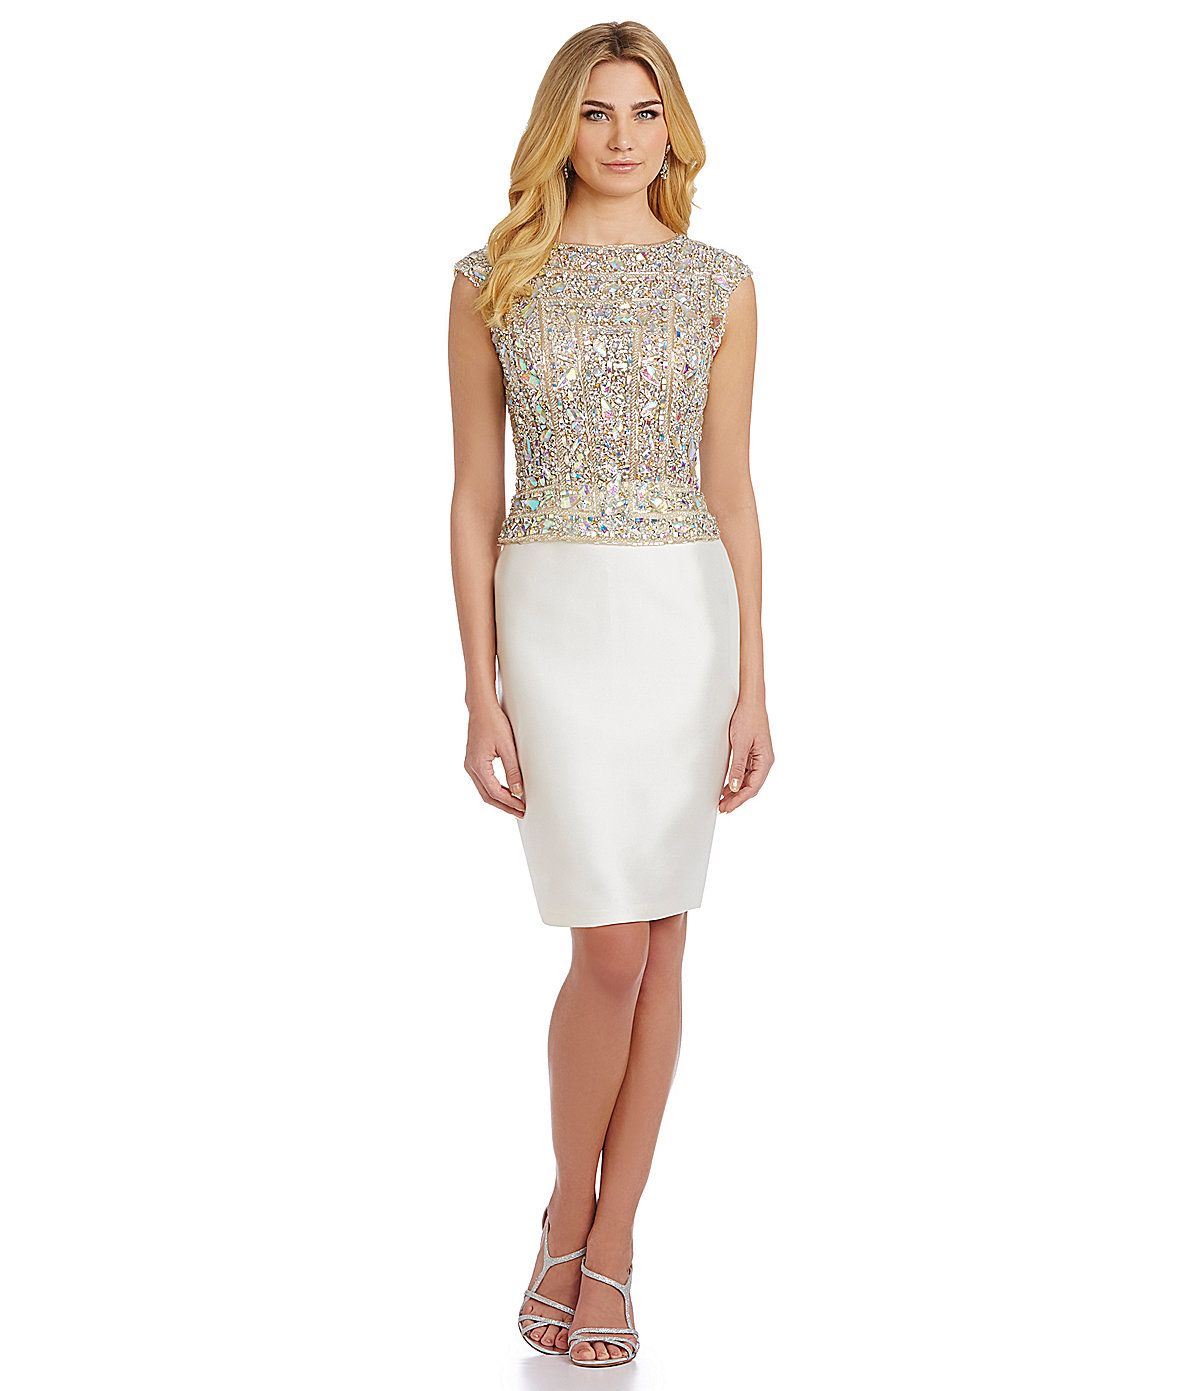 Terani Couture Beaded Cocktail Sheath Dress | Dillards.com